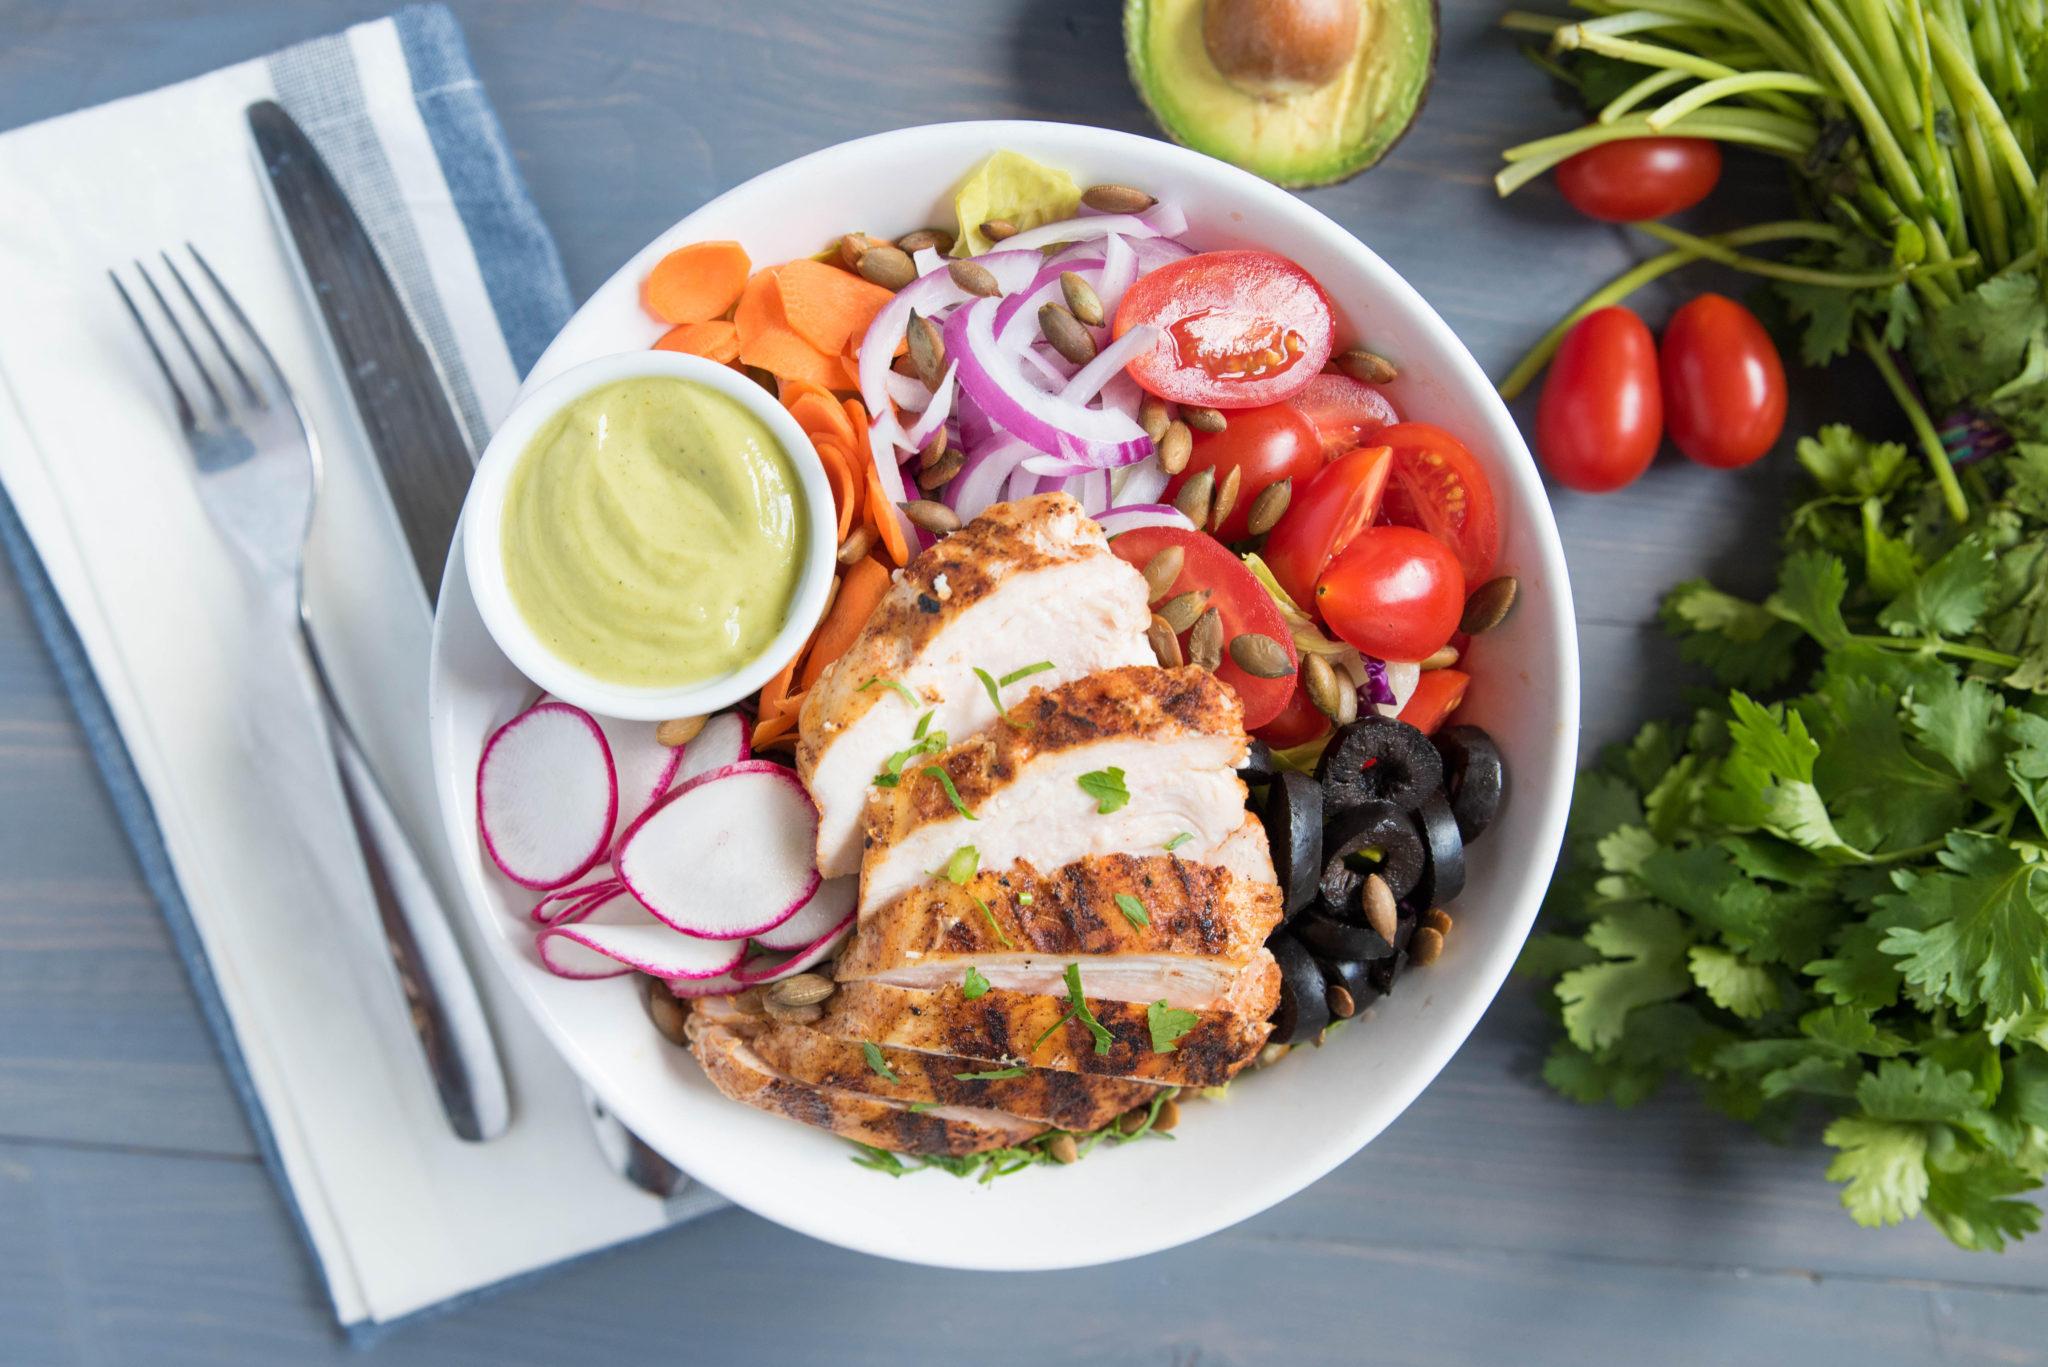 Kitchfix Grilled Chicken Salad with Avocado Vinaigrette